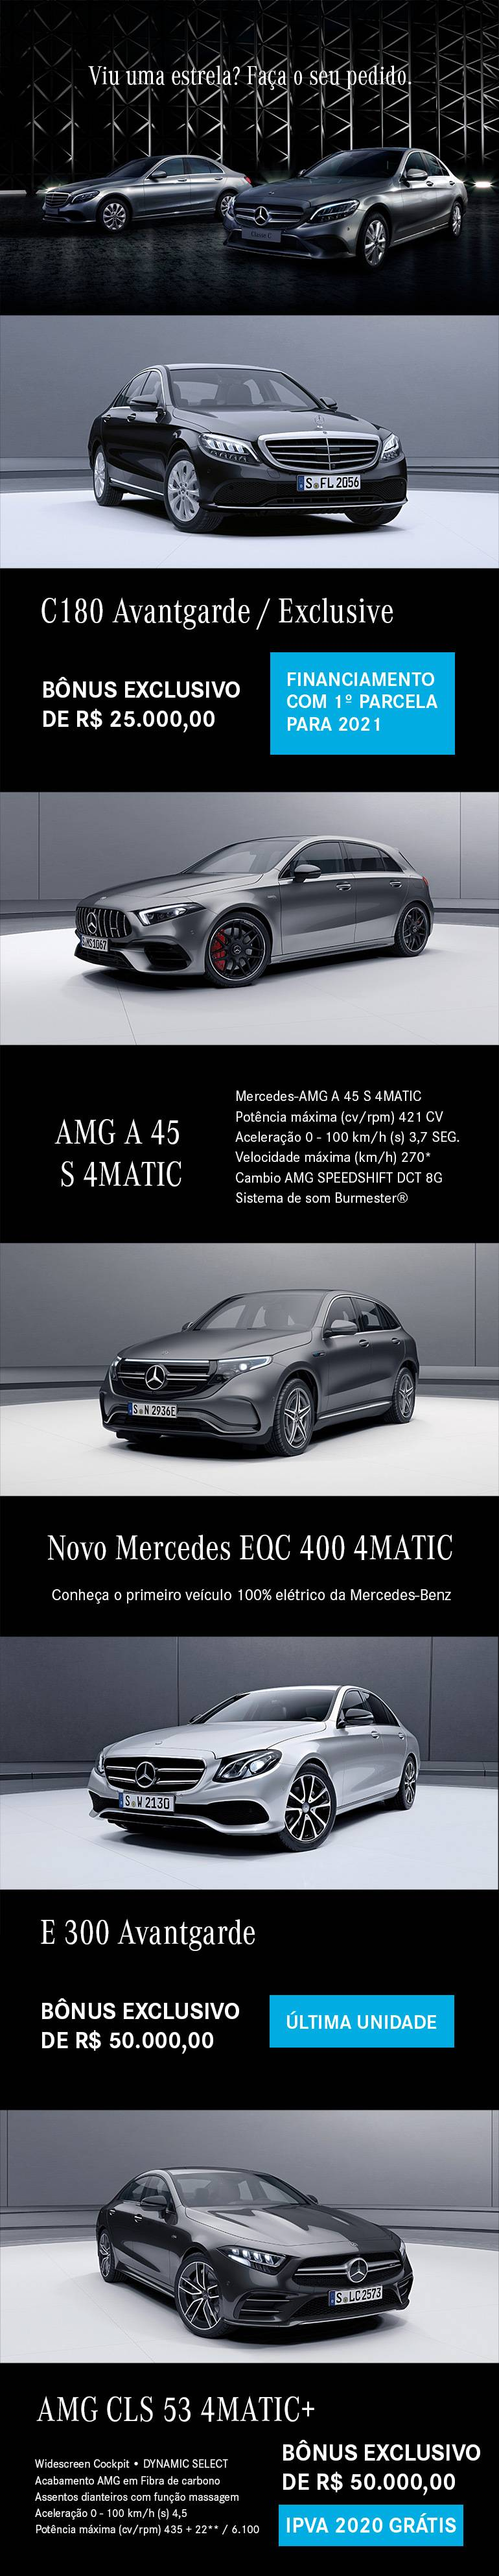 Oferta Mercedes-Benz